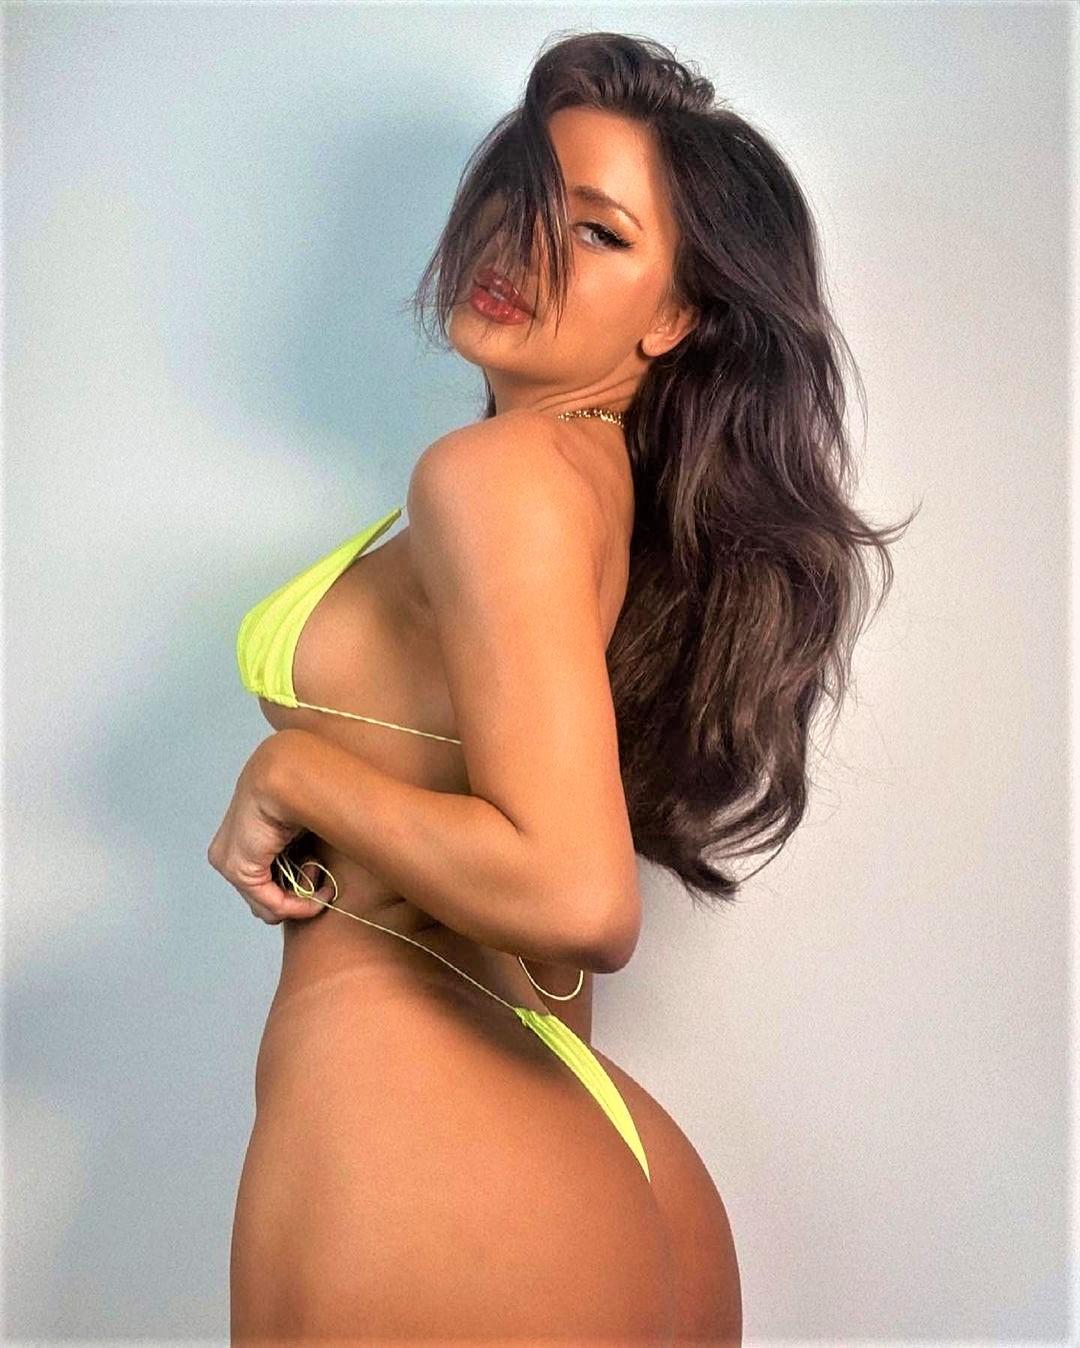 brazilian american women